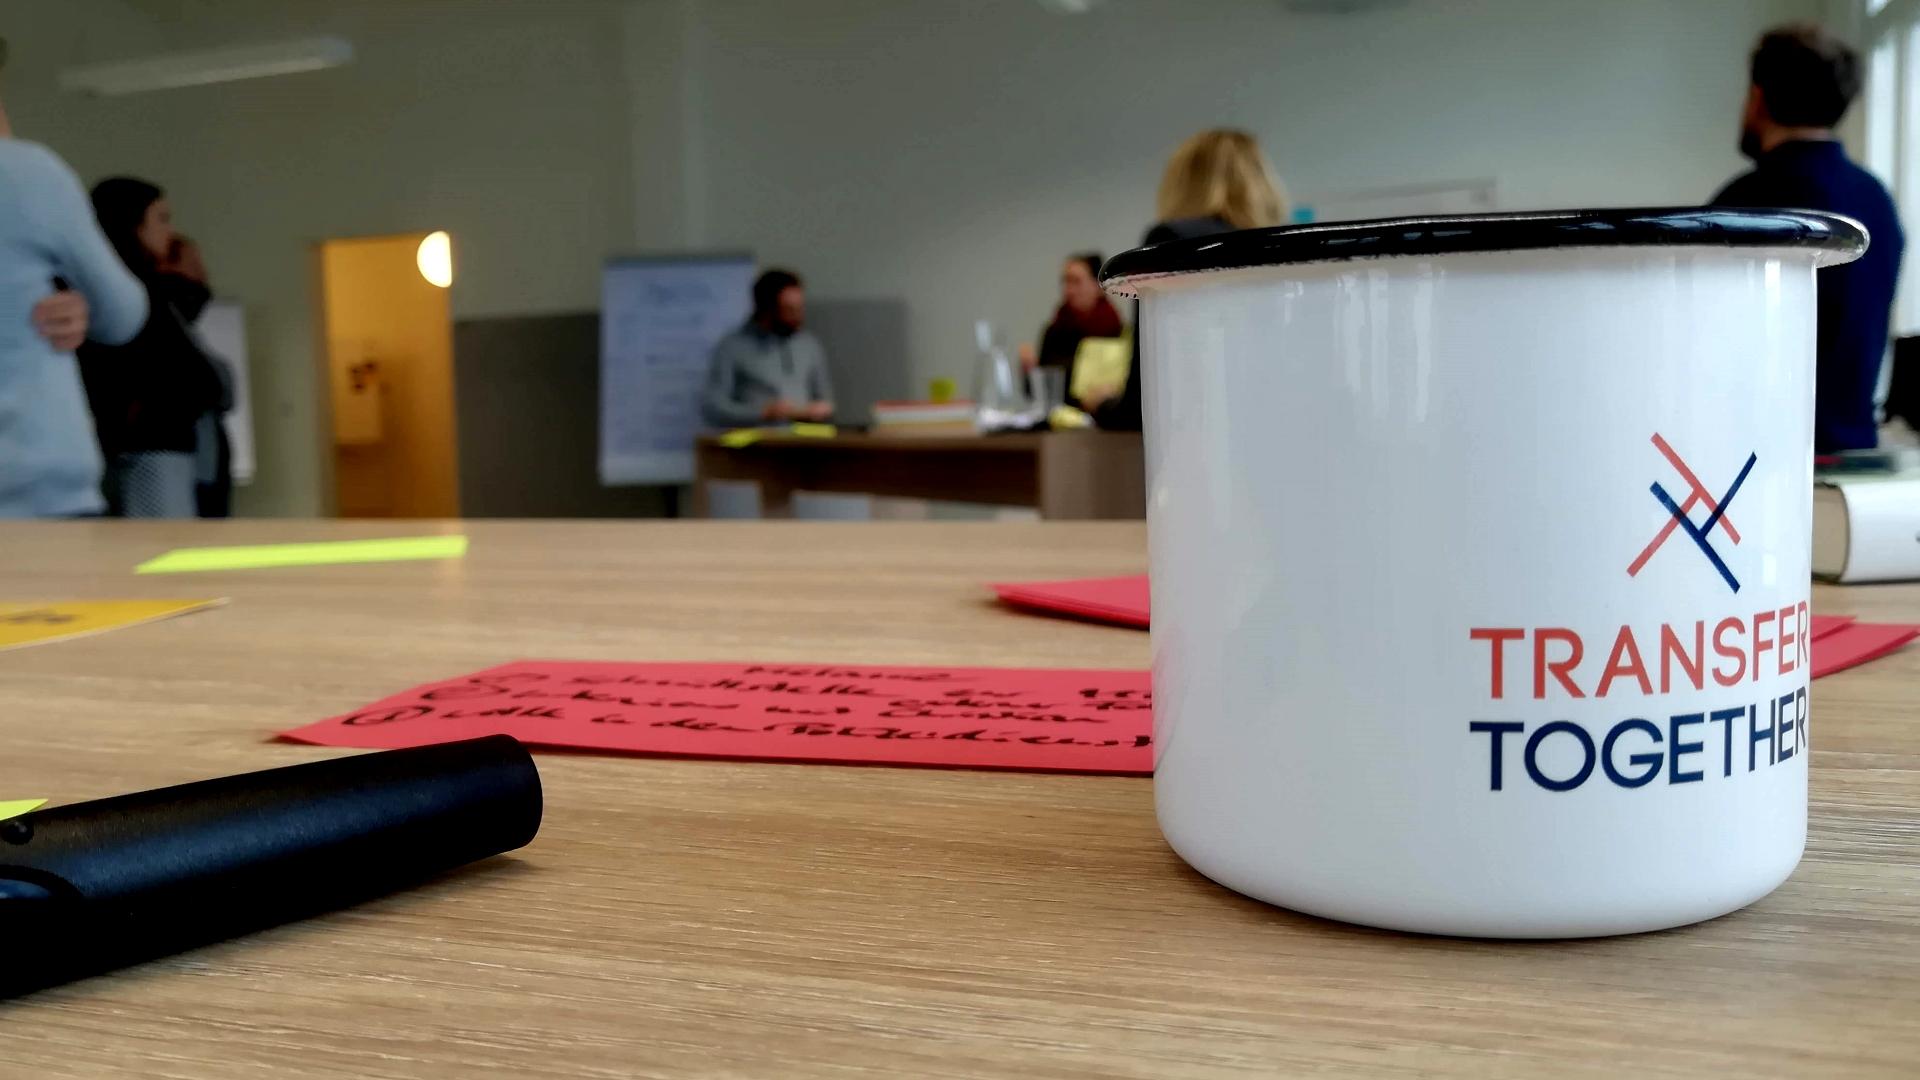 Workshop, PH Heidelberg, Transfer Together, Transferzentrum, Tasse, Logo